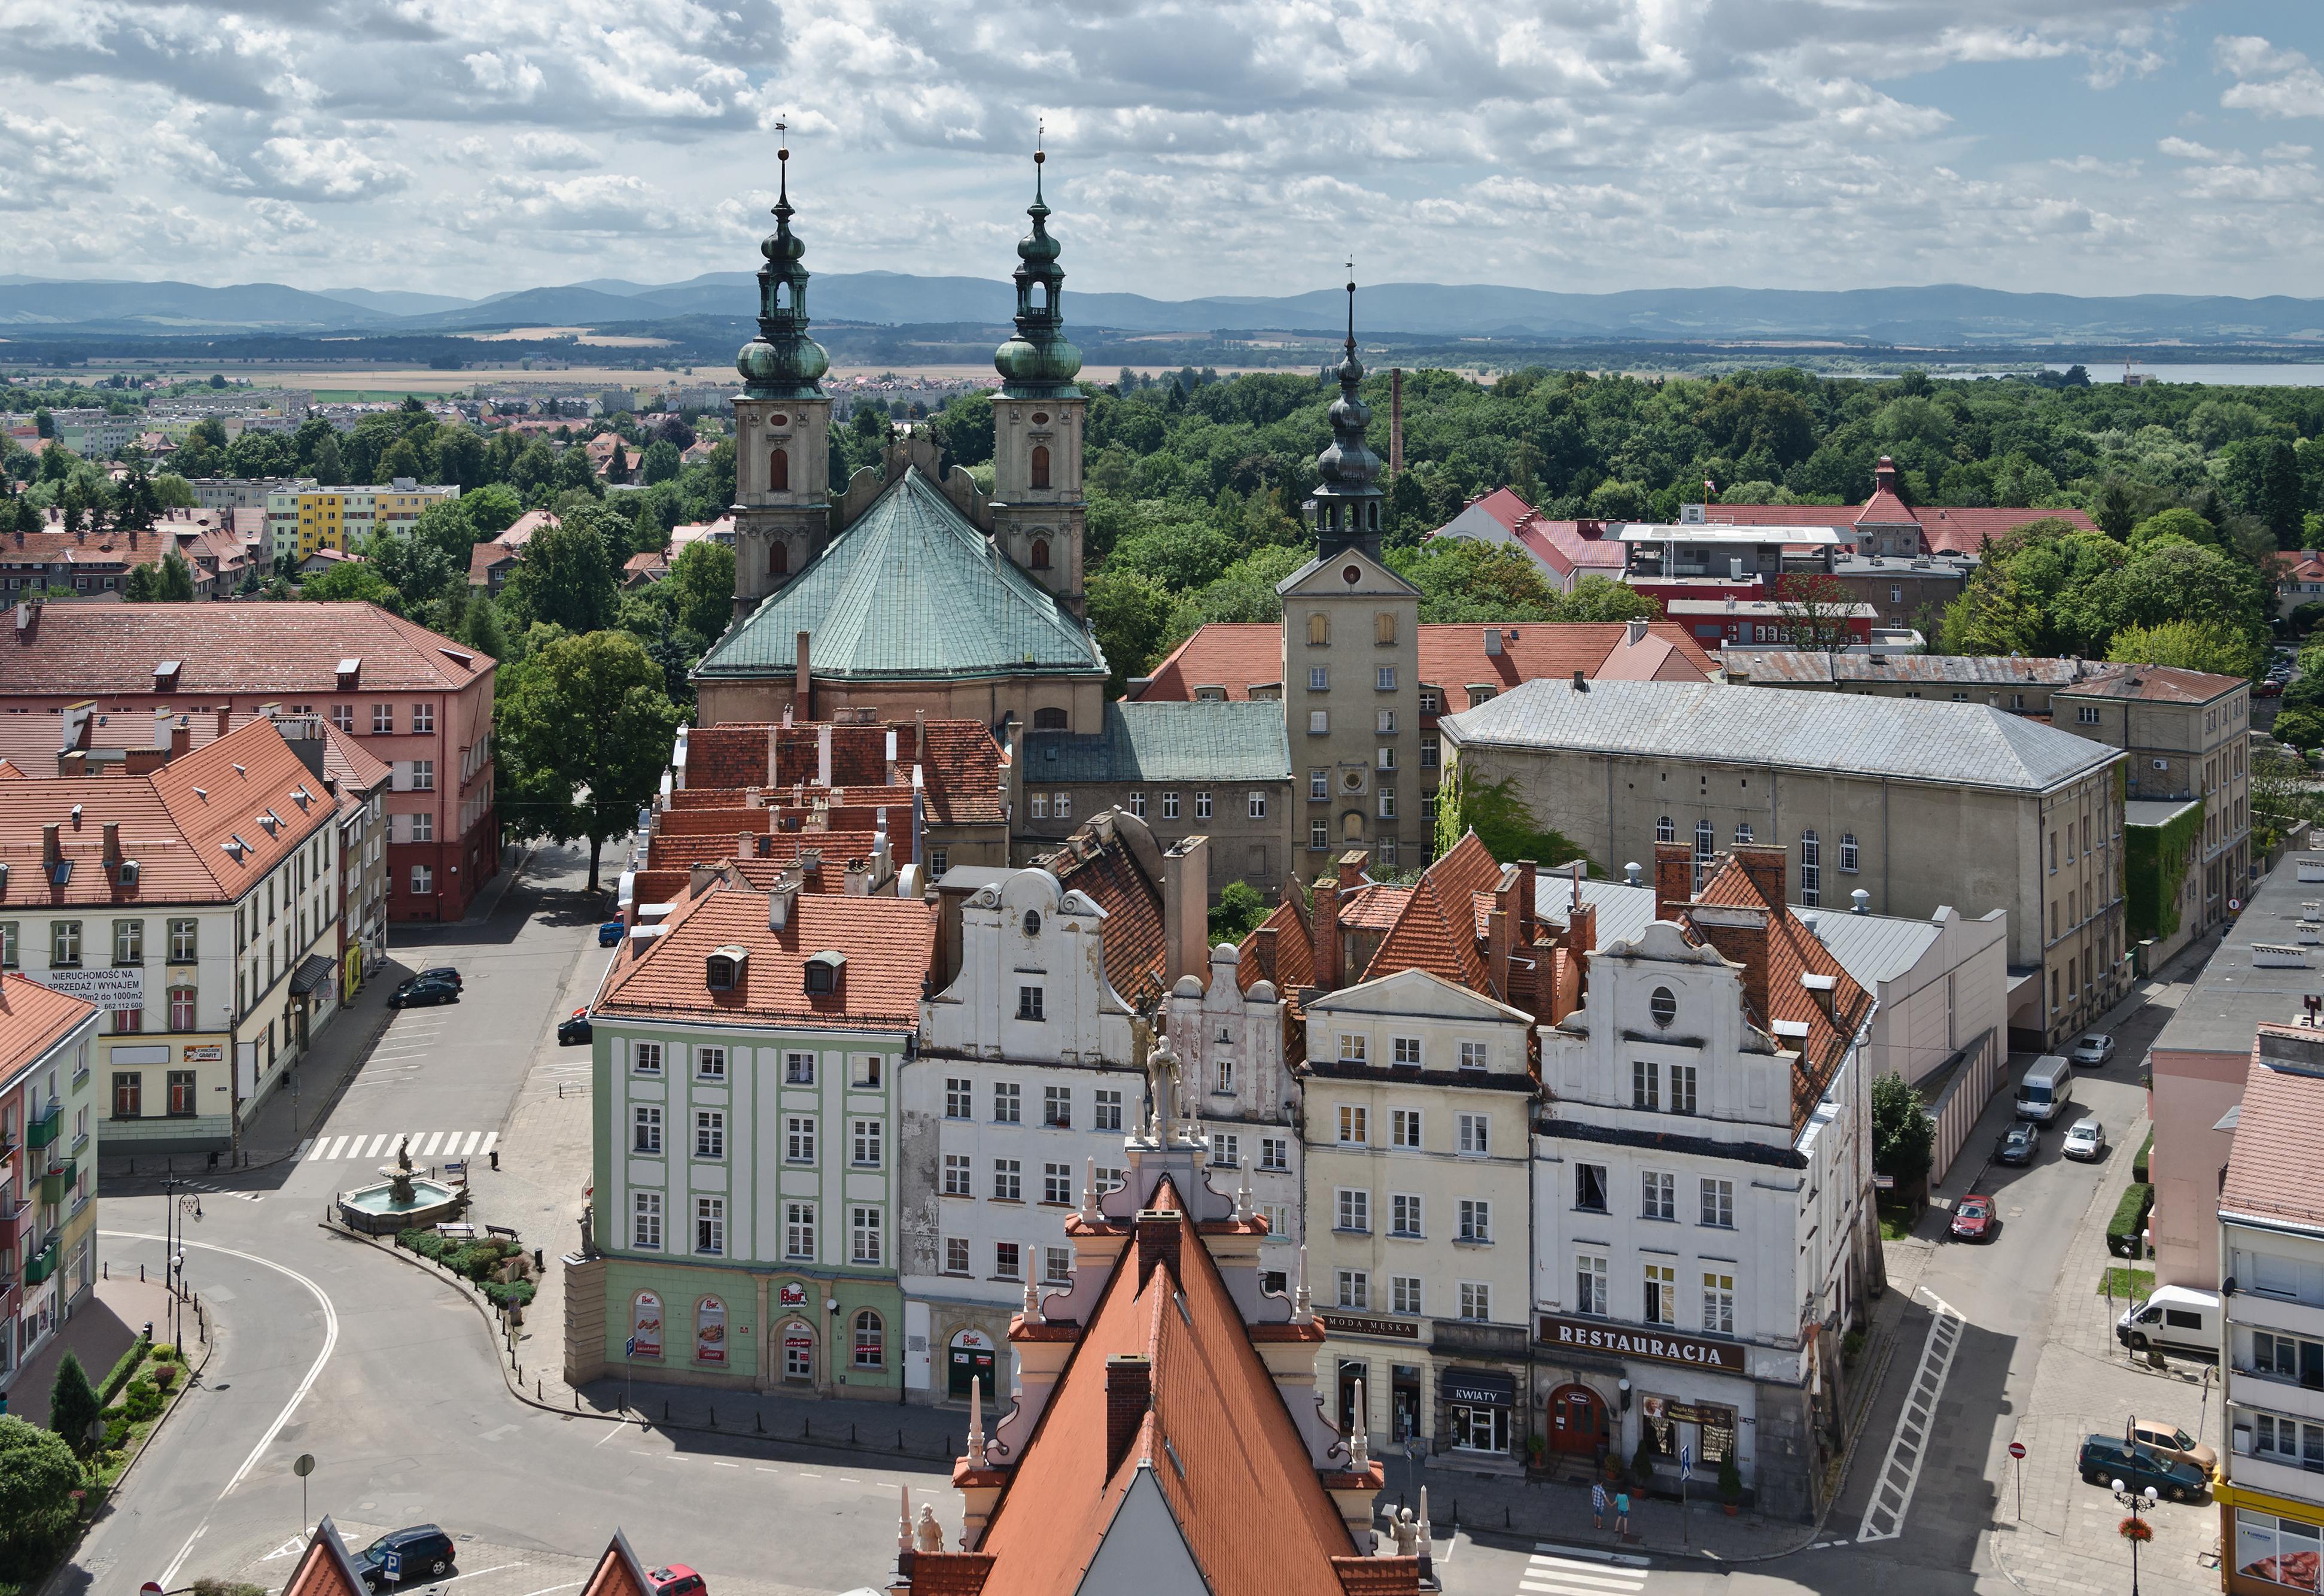 Plik:2014 Nysa, stare miasto 03.JPG – Wikipedia, wolna encyklopedia